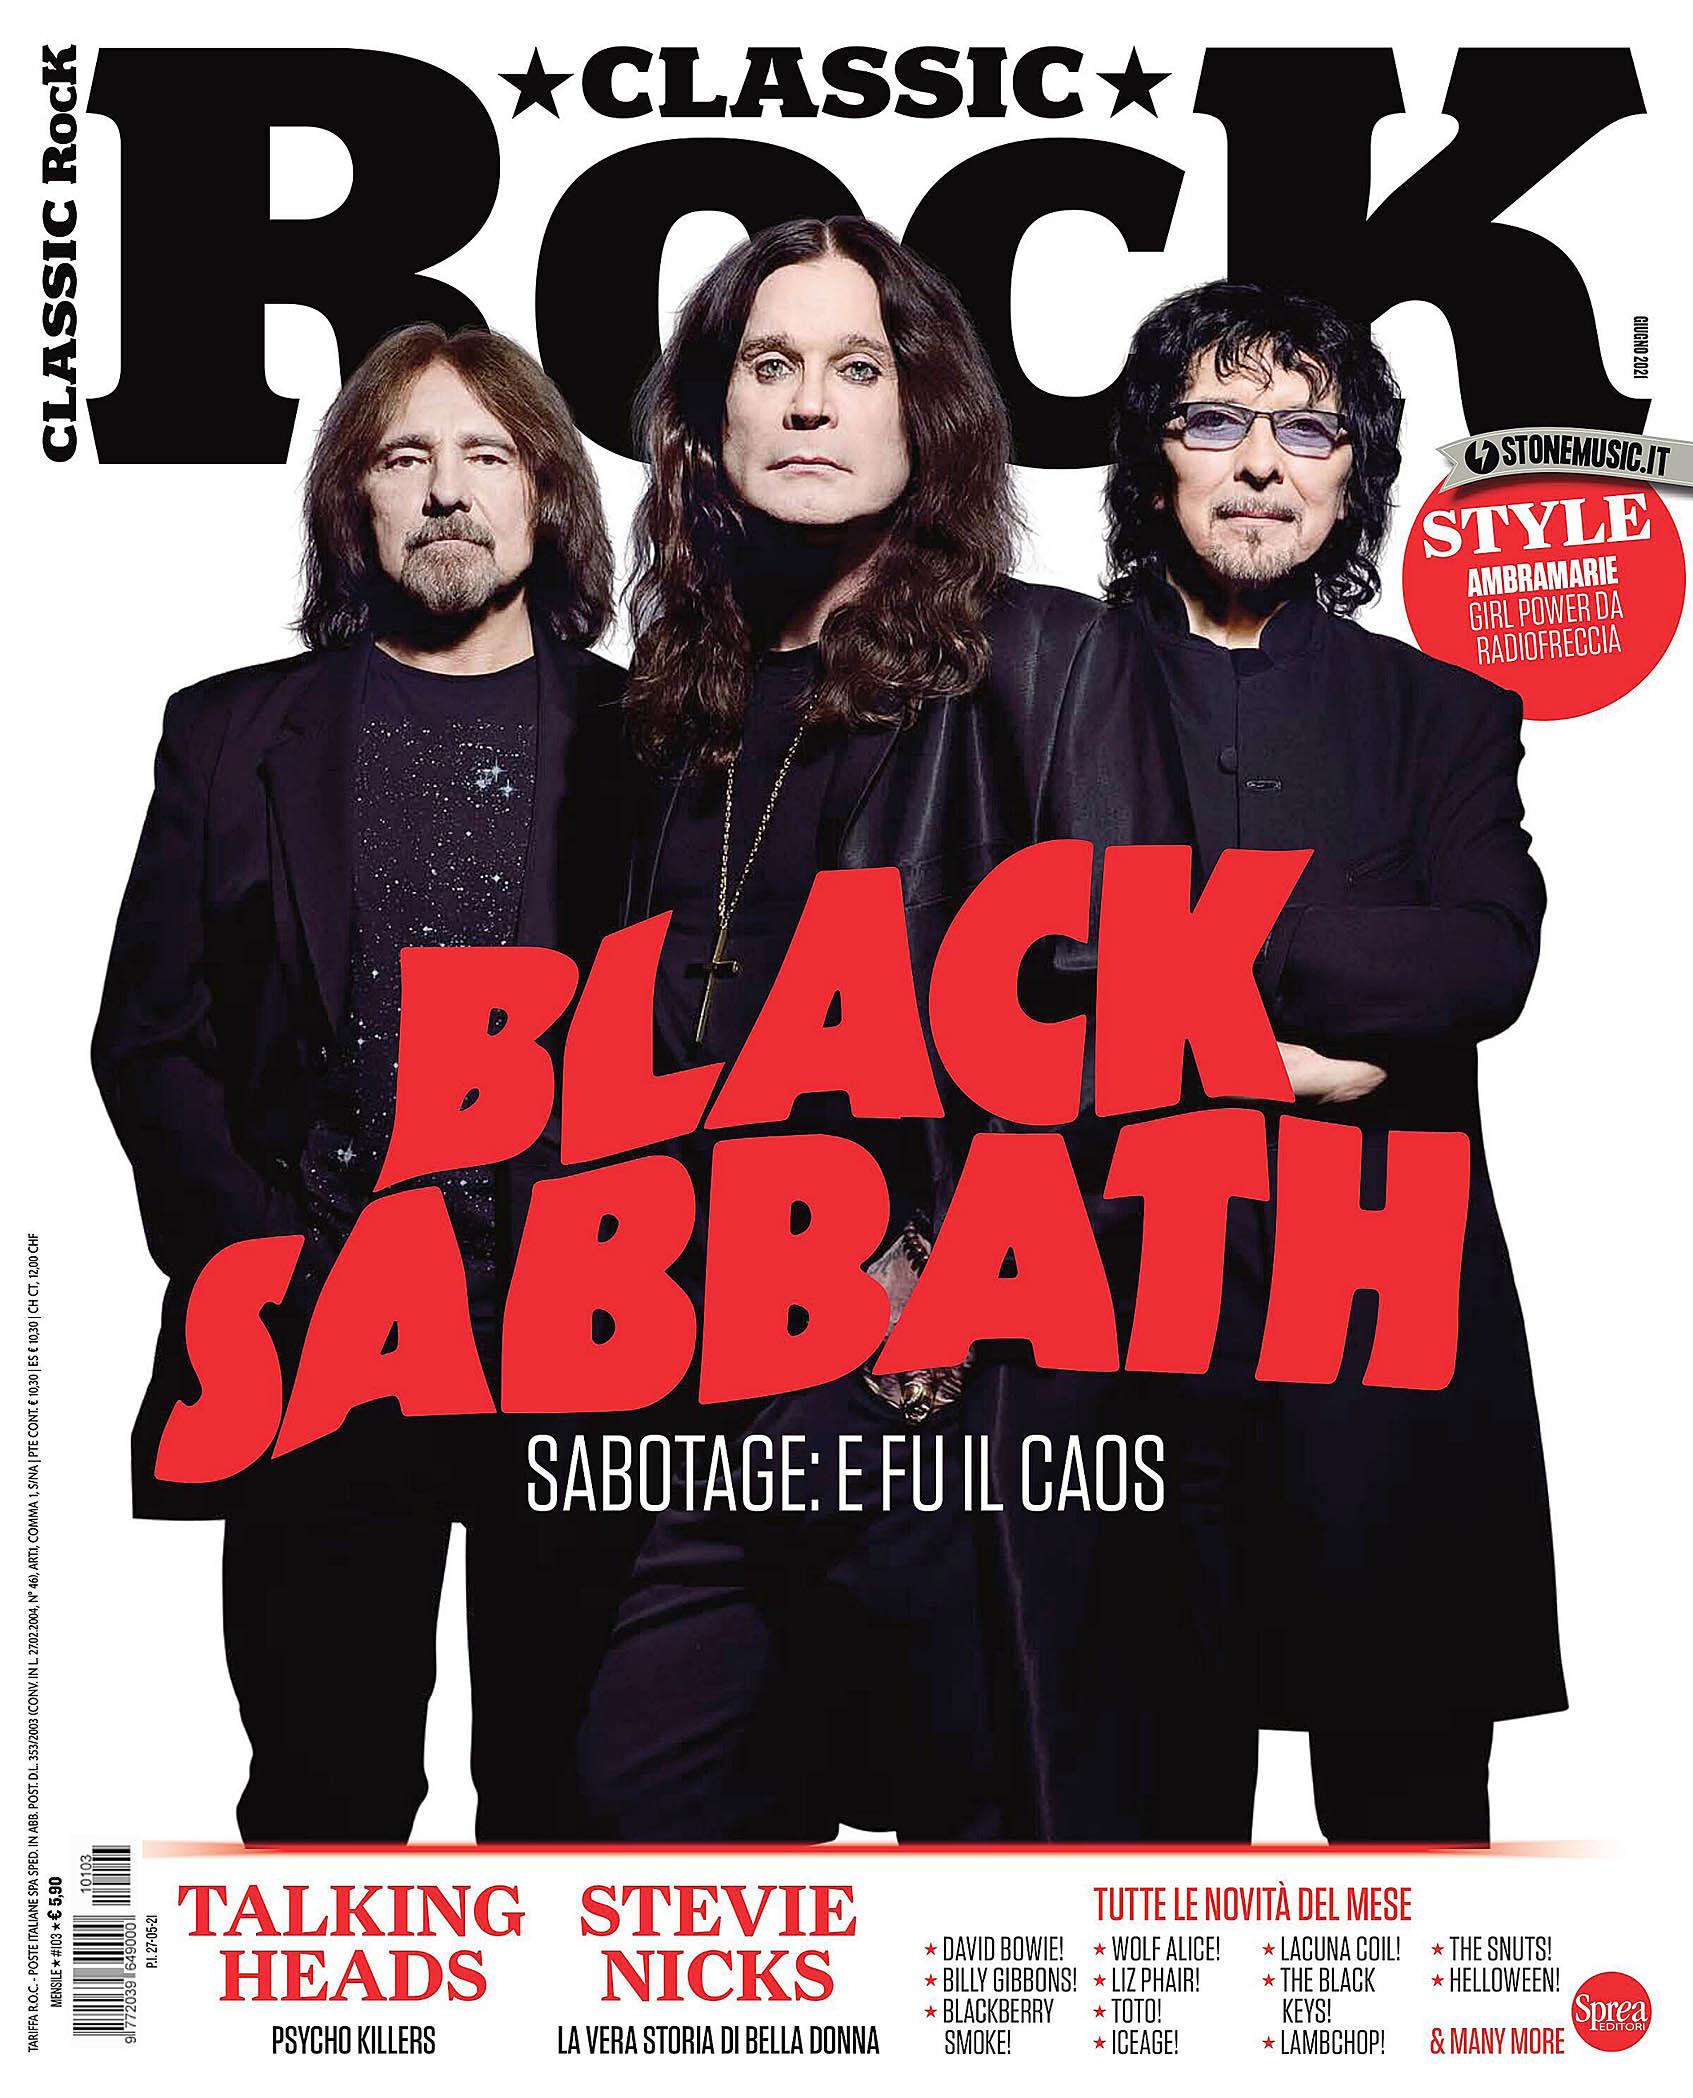 Classic Rock Italy 2021-06 BSabbath 01.jpg